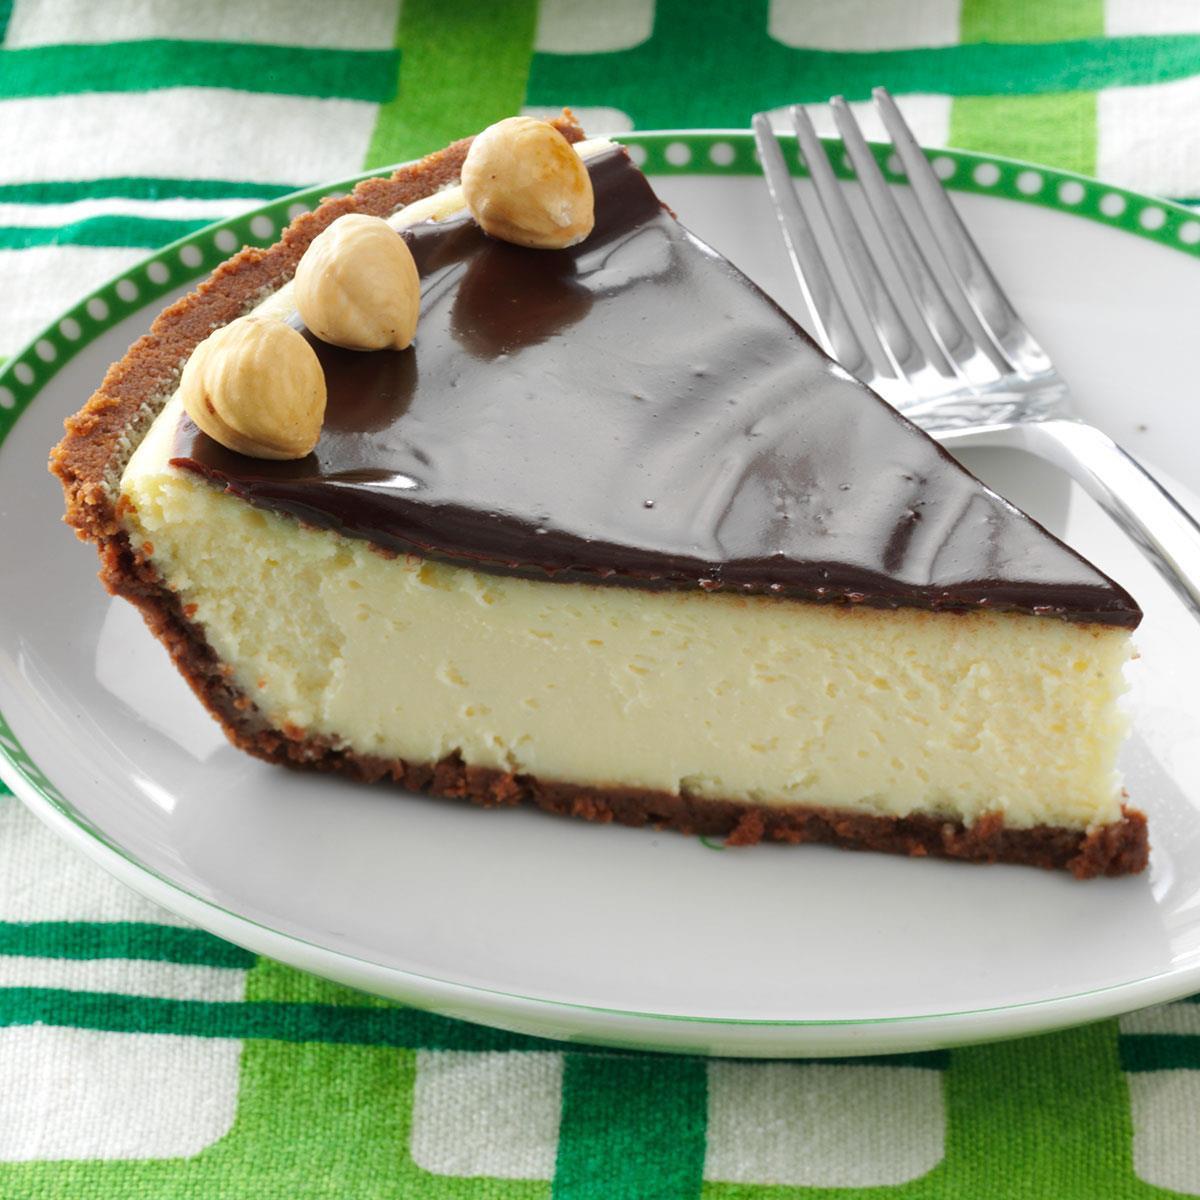 Italian Chocolate Desserts  Italian Chocolate Hazelnut Cheesecake Pie Recipe